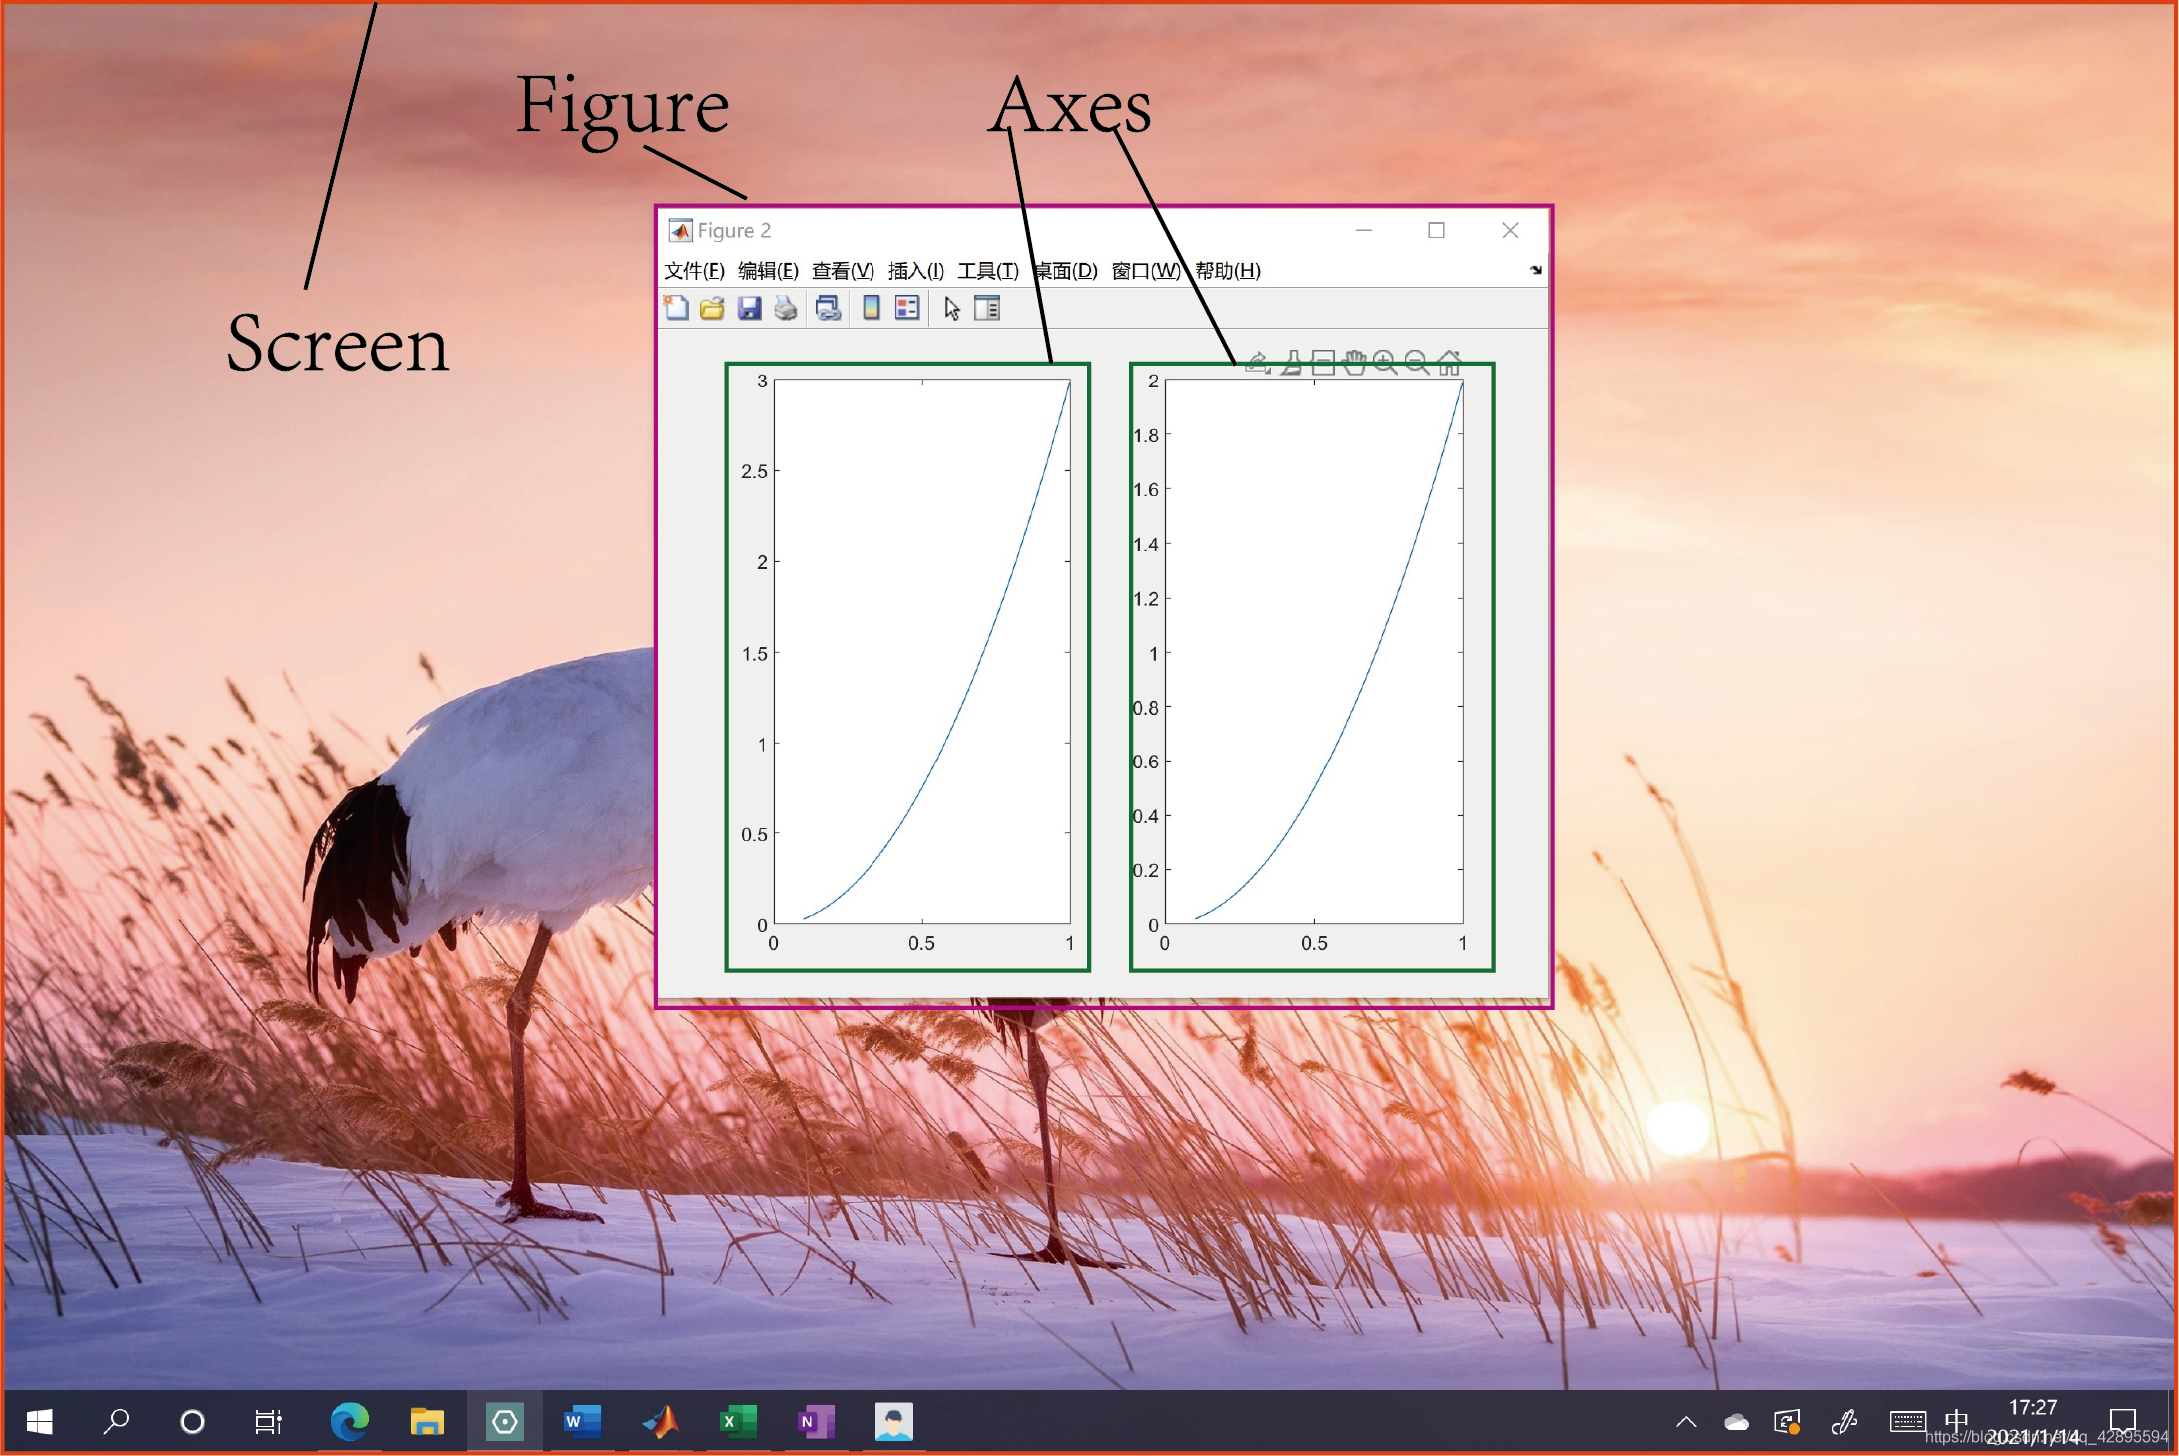 Screen,Figure, Axes示意